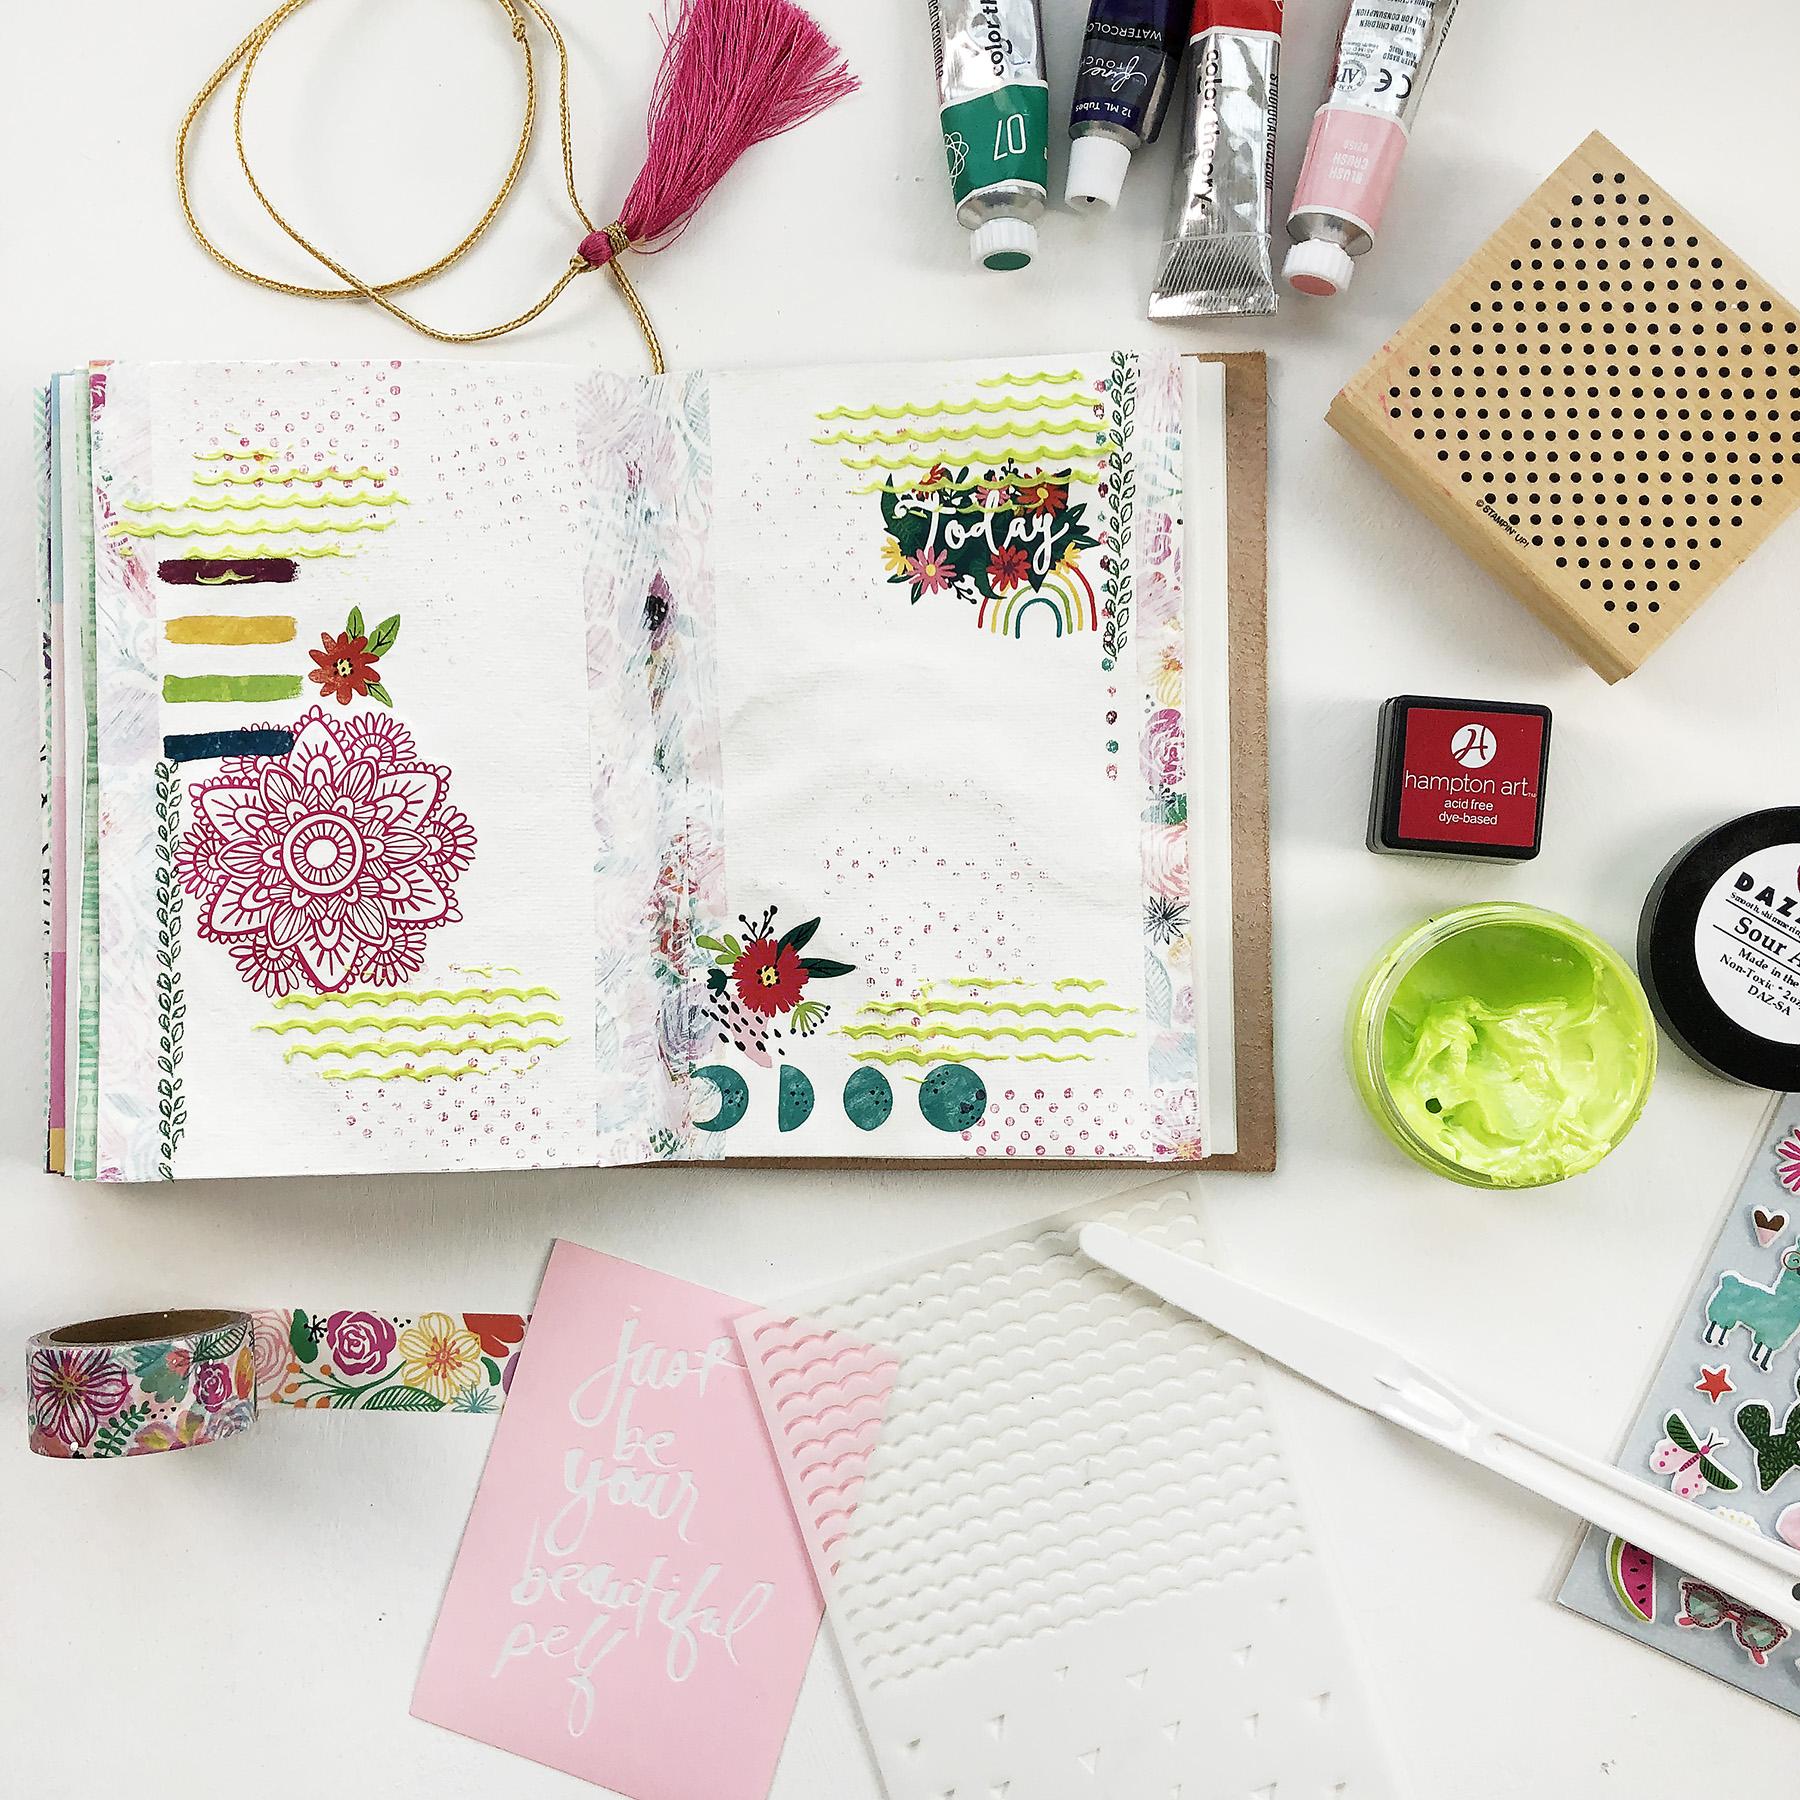 Larkindesign Art Journal Volume 04 | Your Beautiful Self